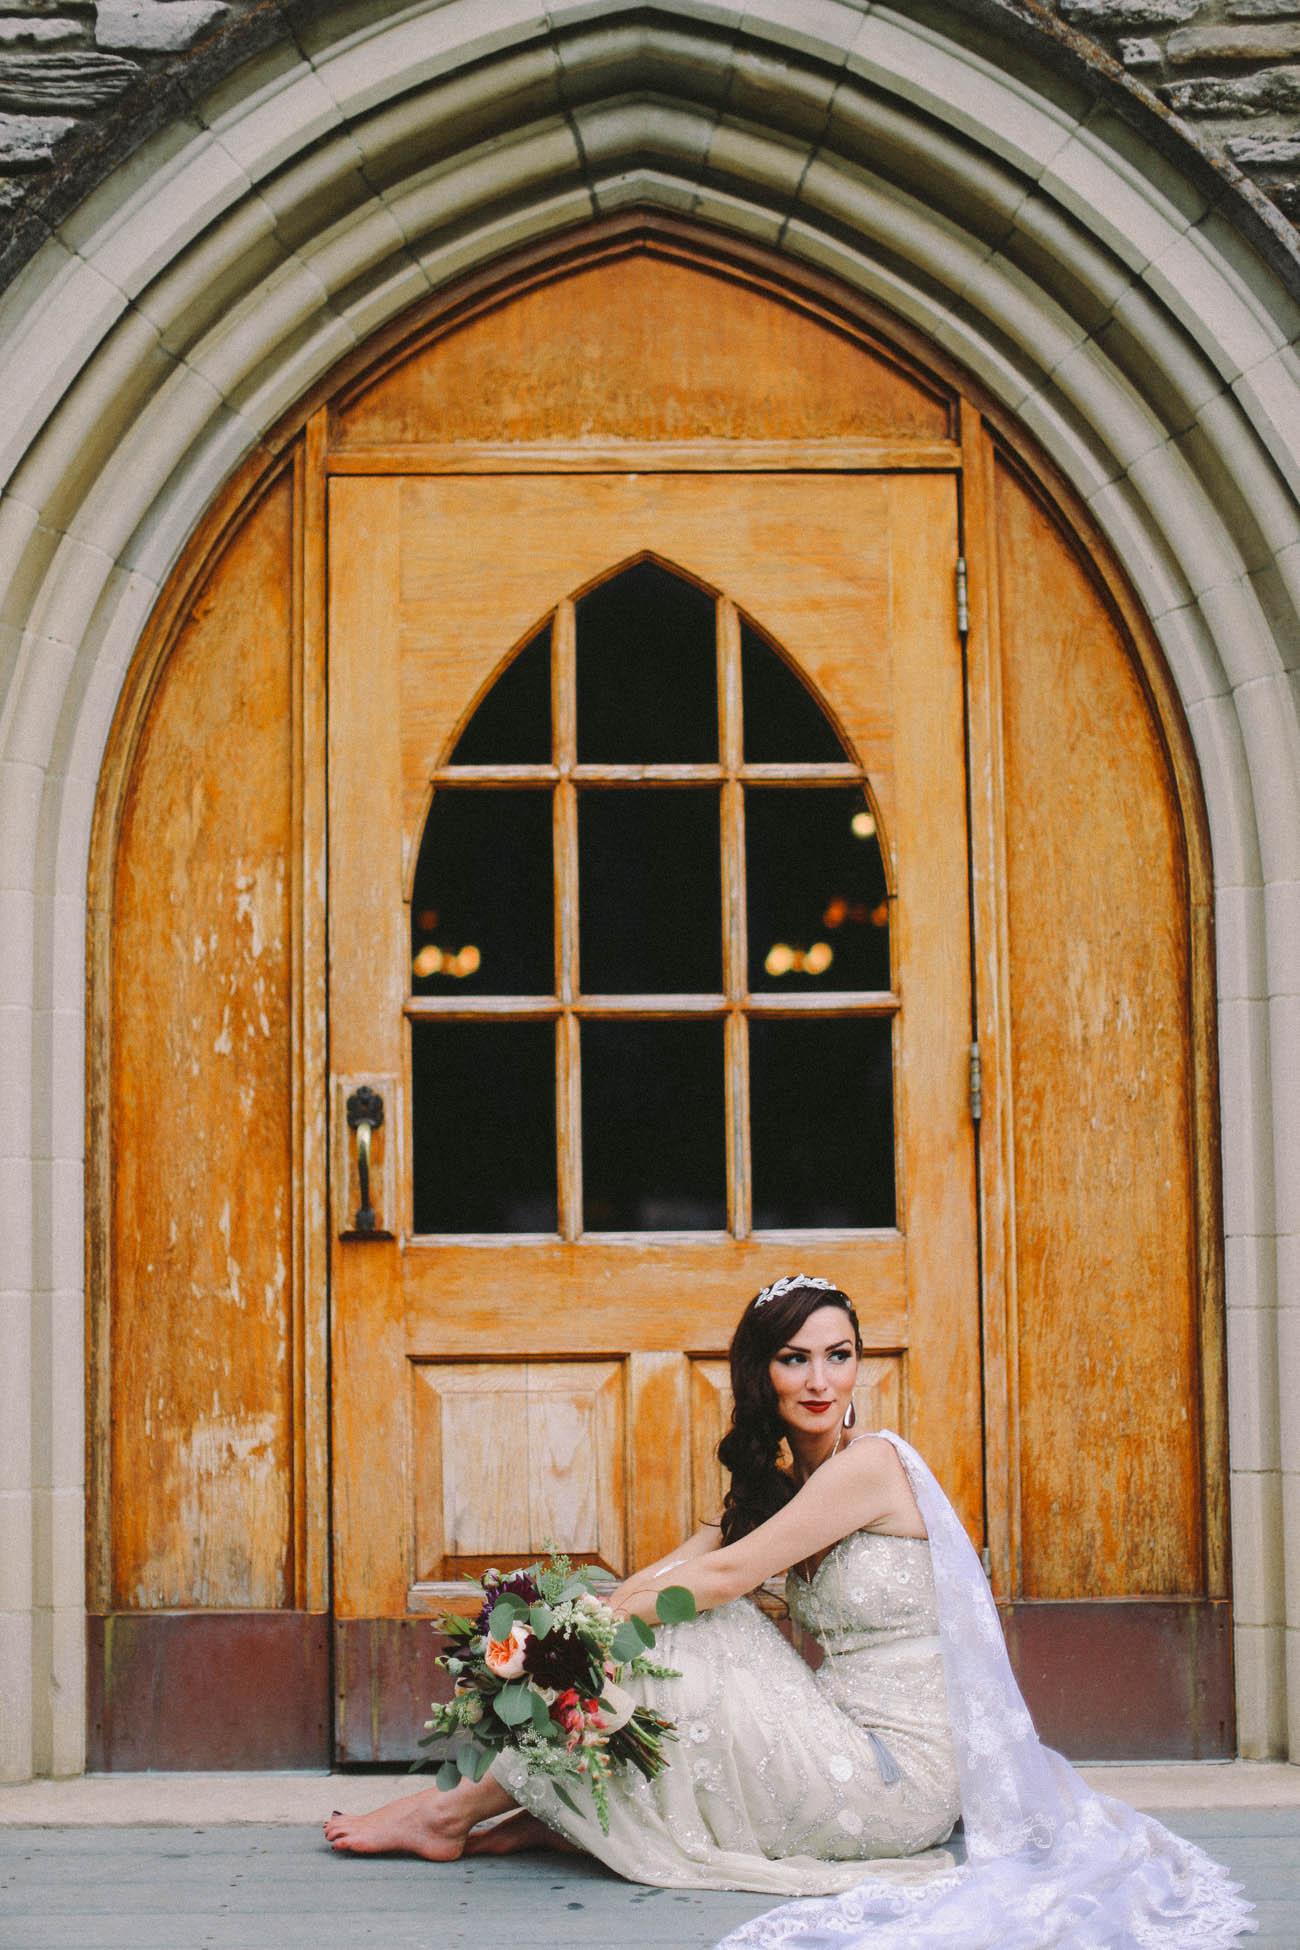 Speakeasy-1920s-theme-Louisville-and-Lexington Wedding-332.jpg